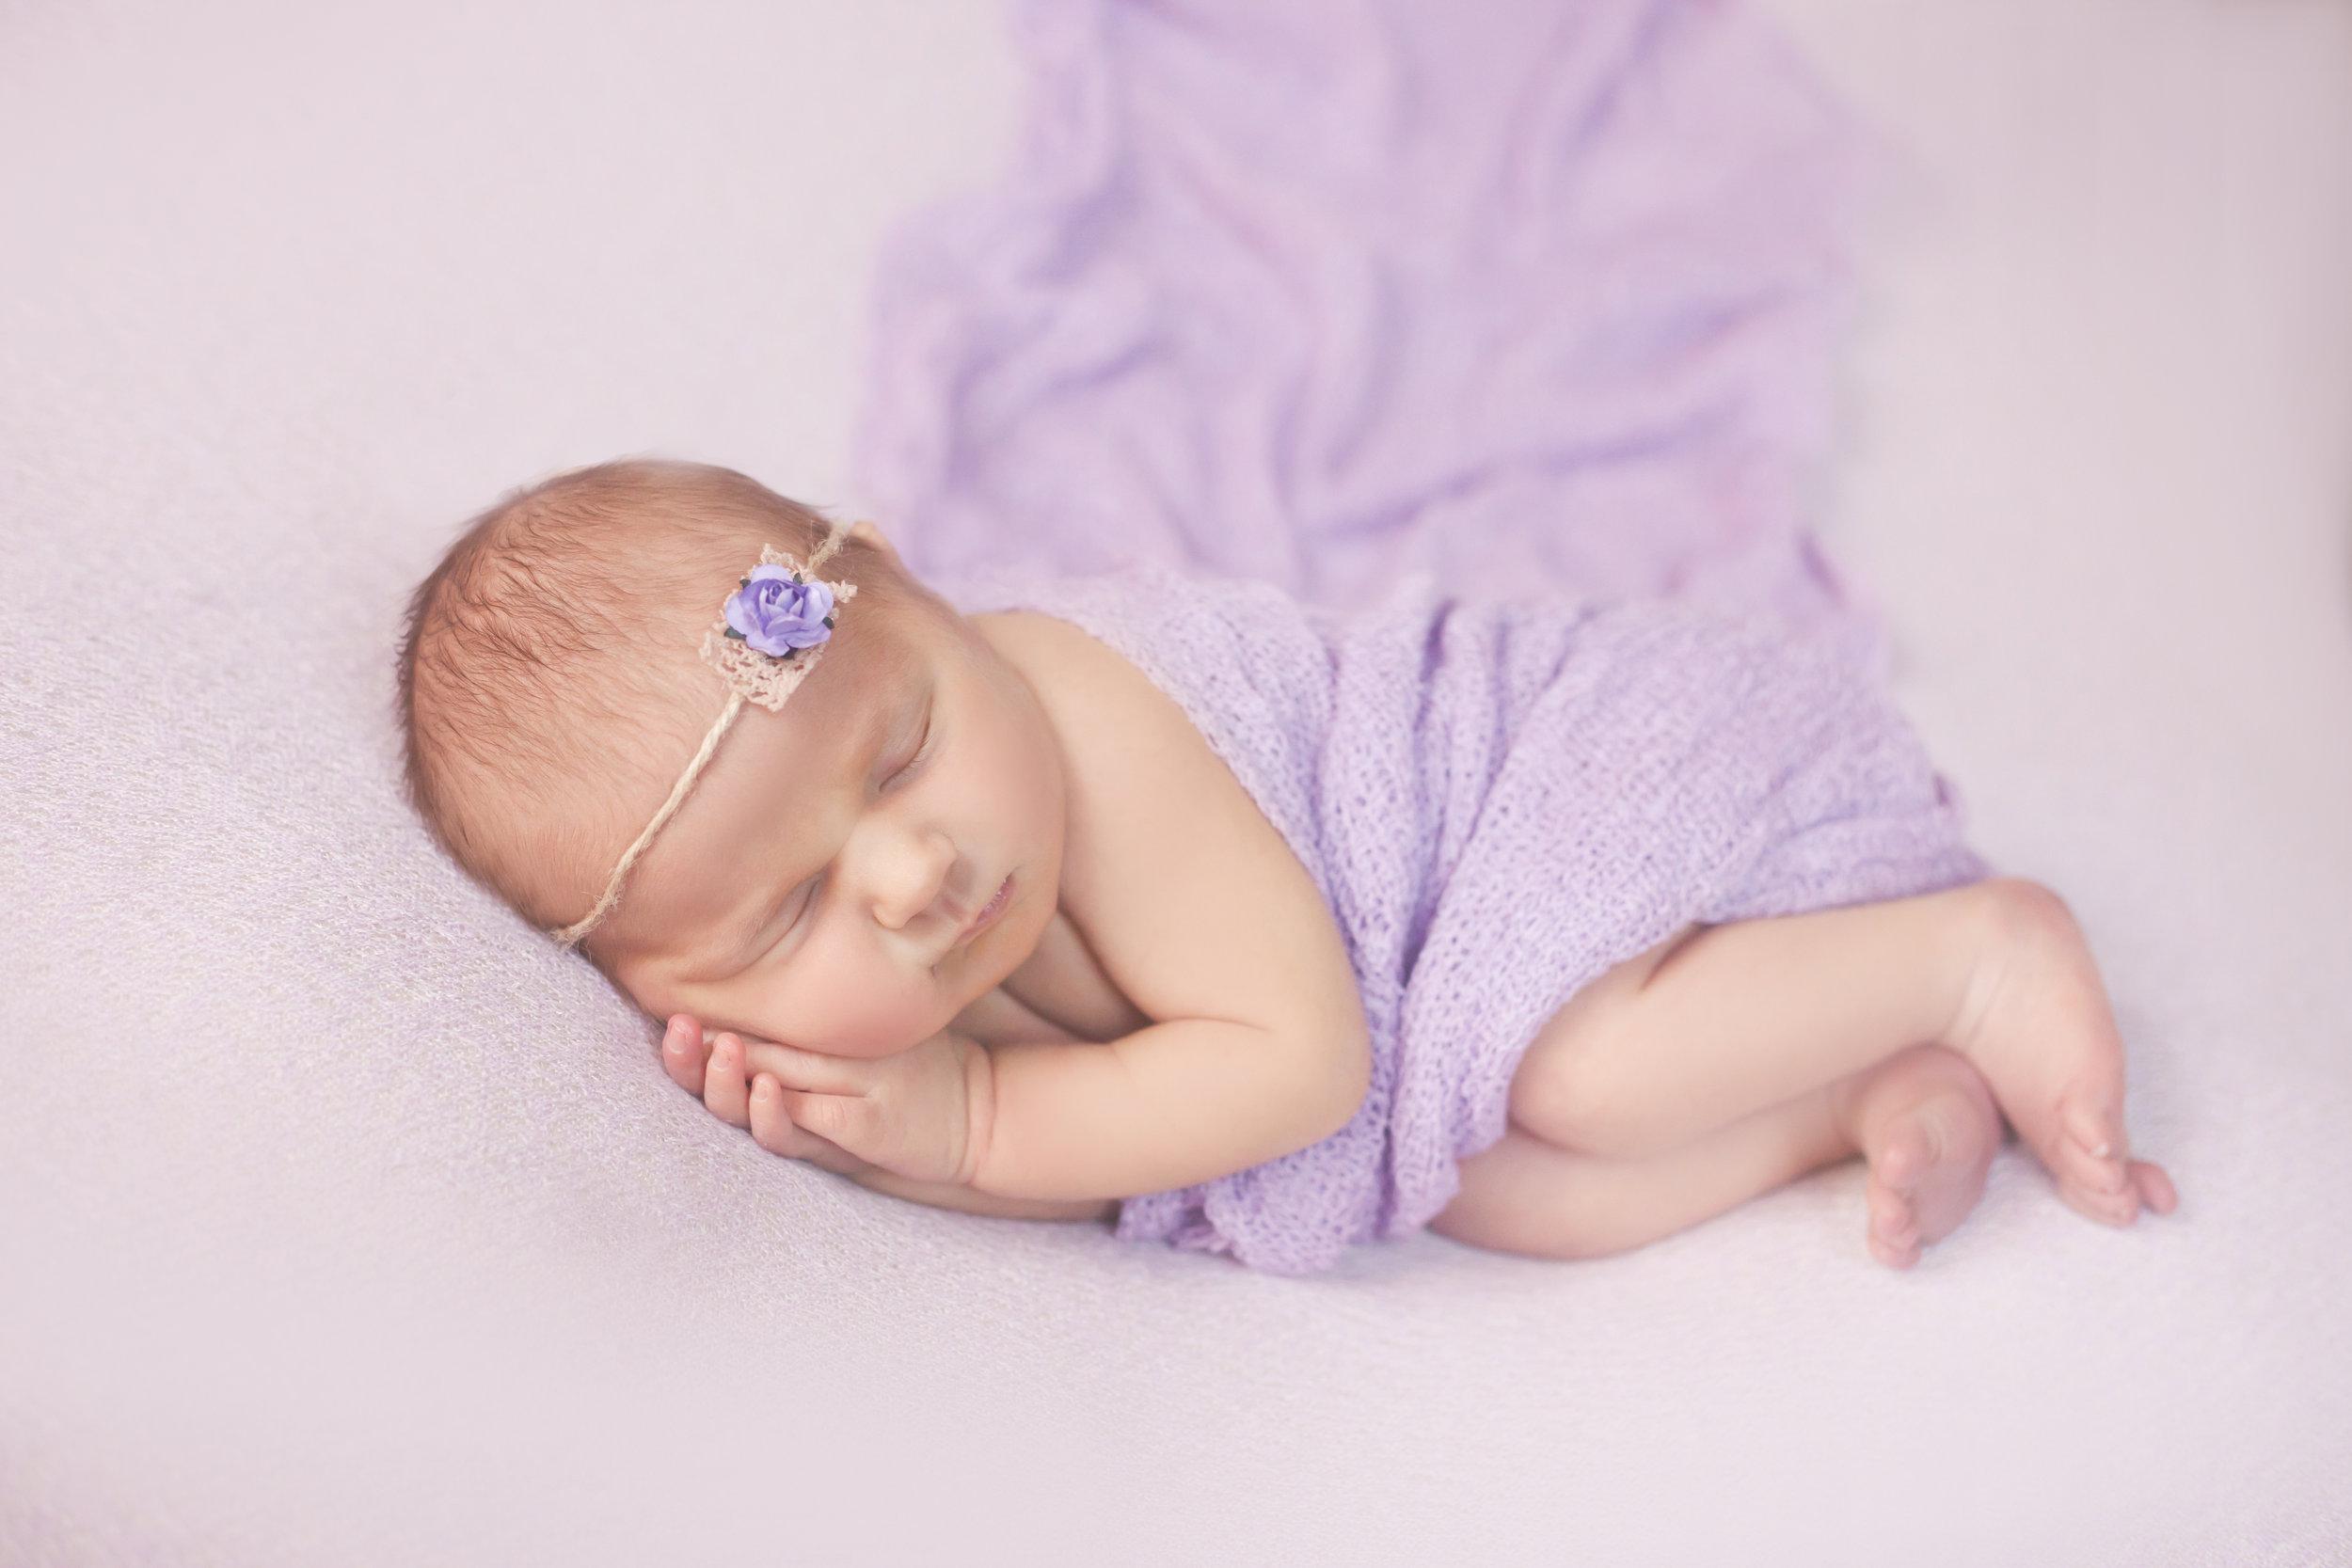 Blush-Little-Baby-Plano-Newborn-Photography-Maisey-6.jpg